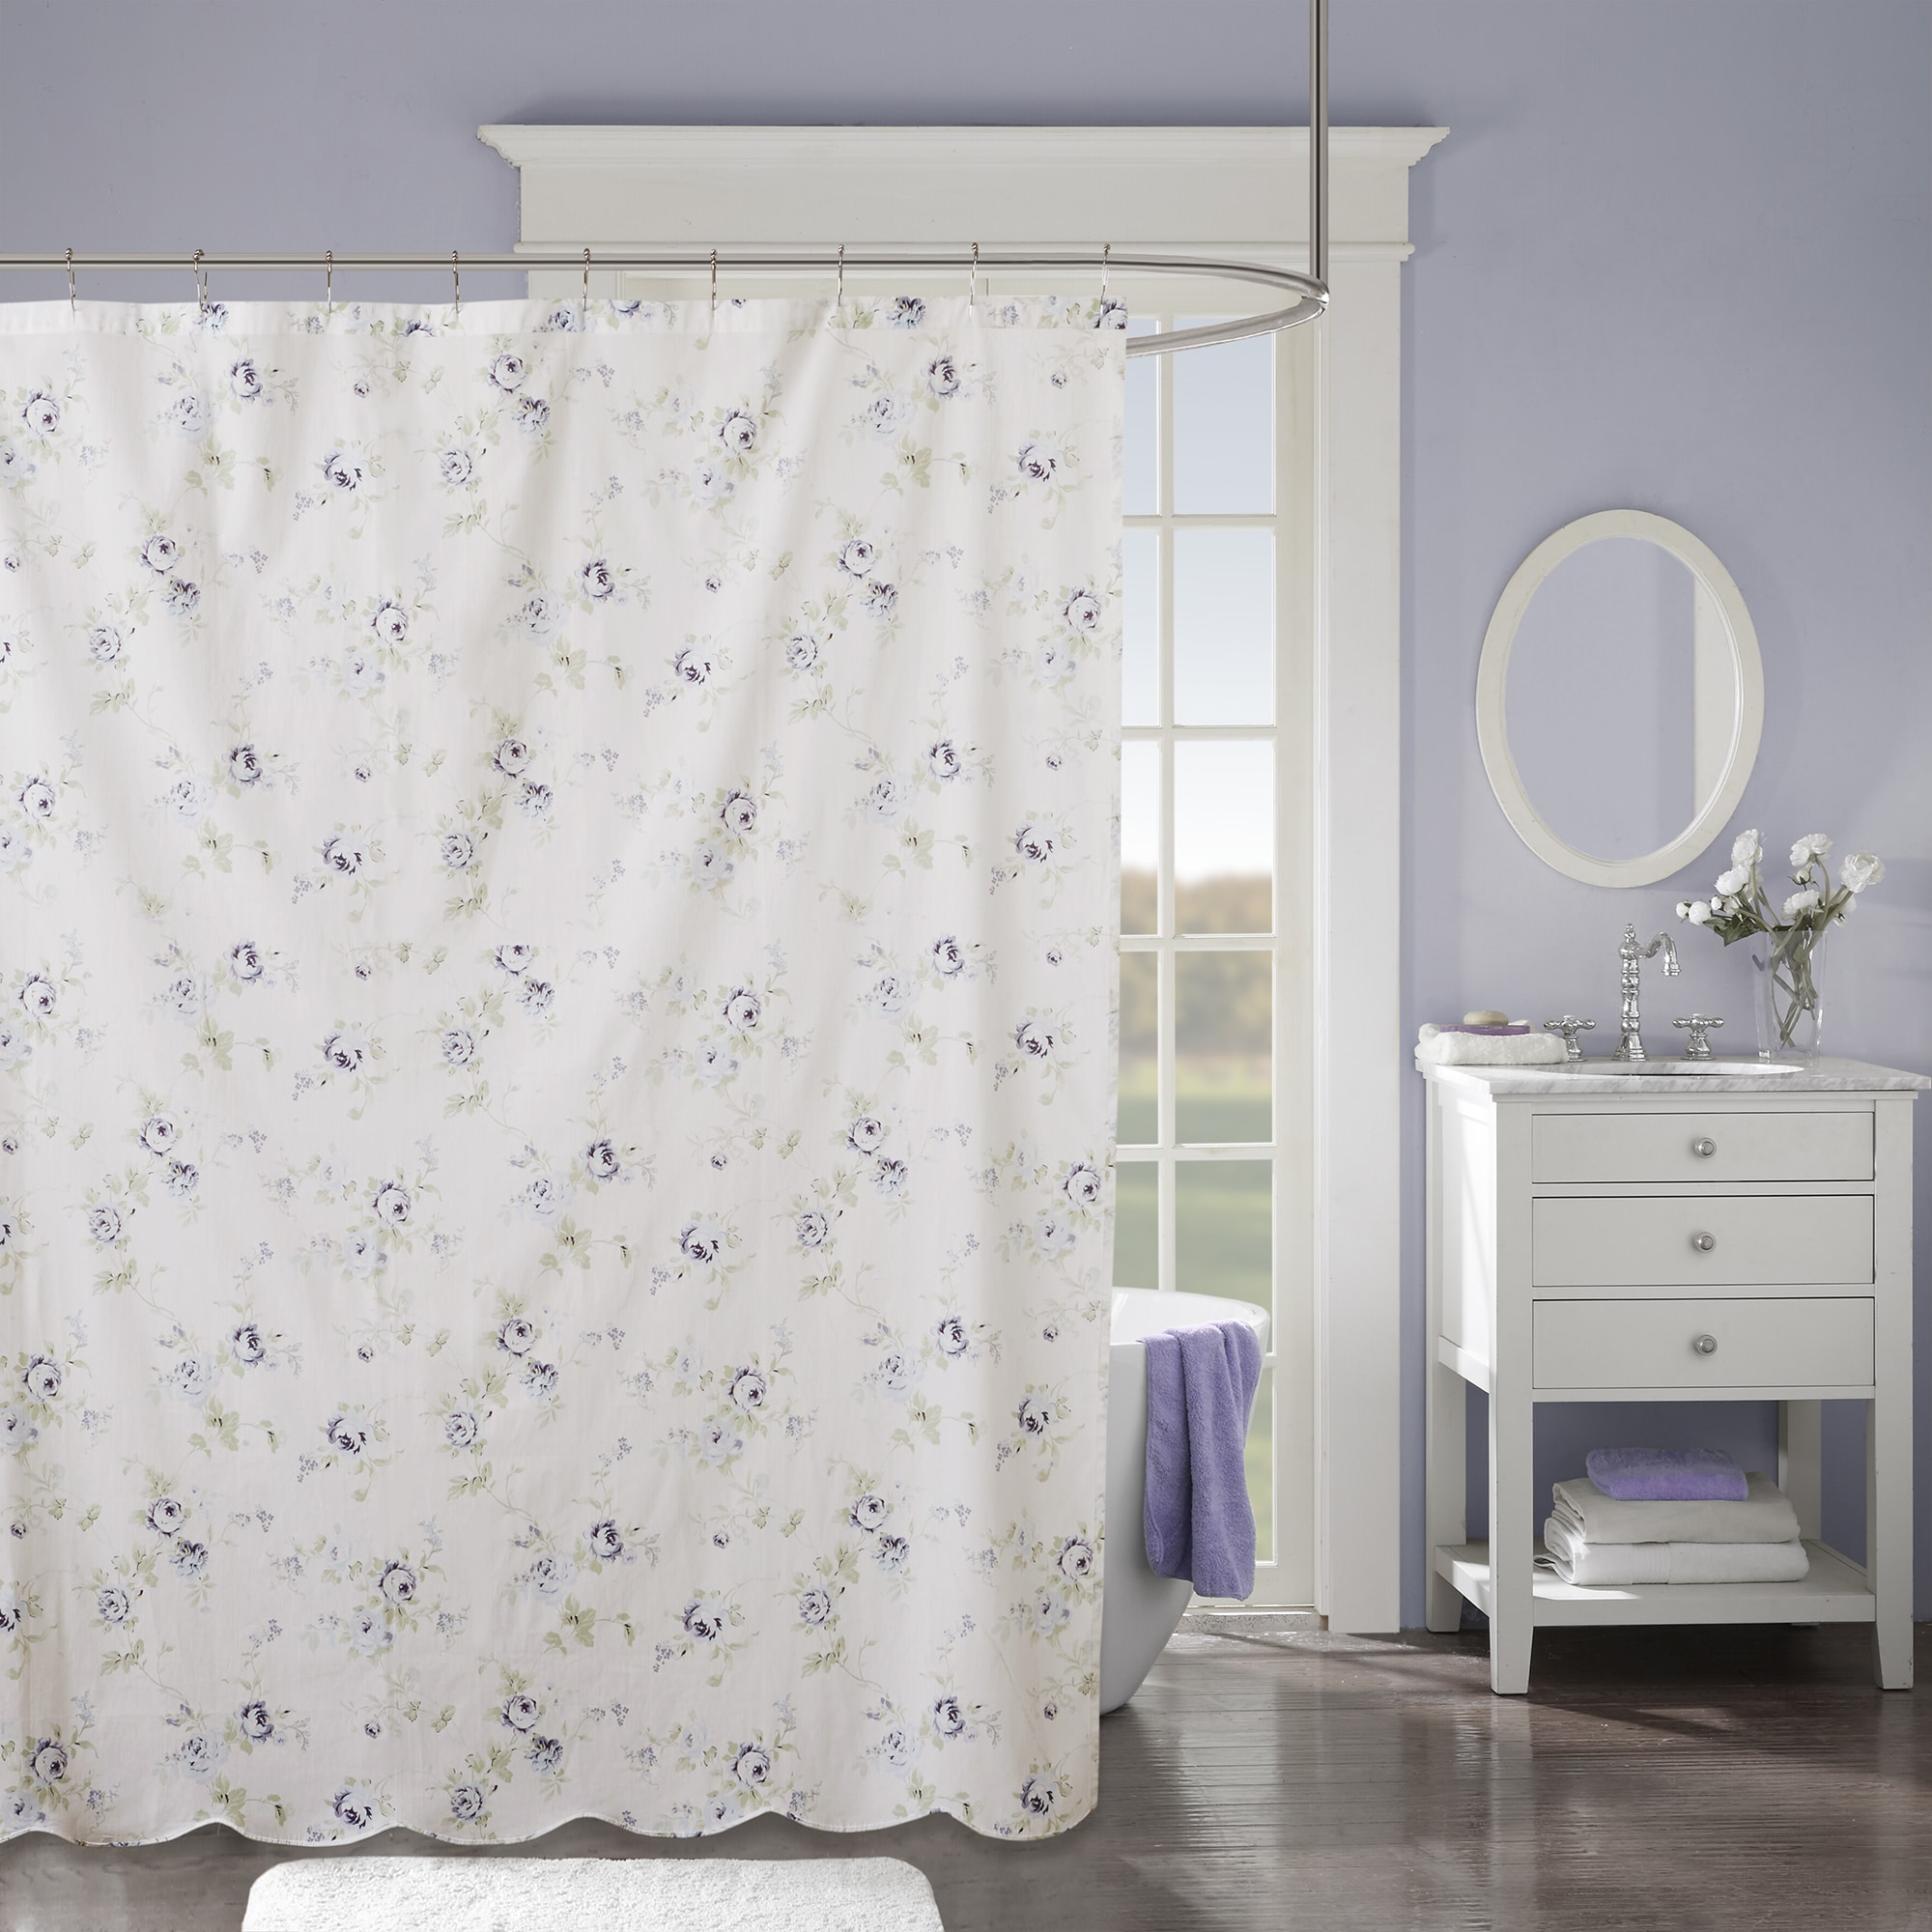 Madison Park Paolina Ivory Cotton Scalloped Shower Curtain